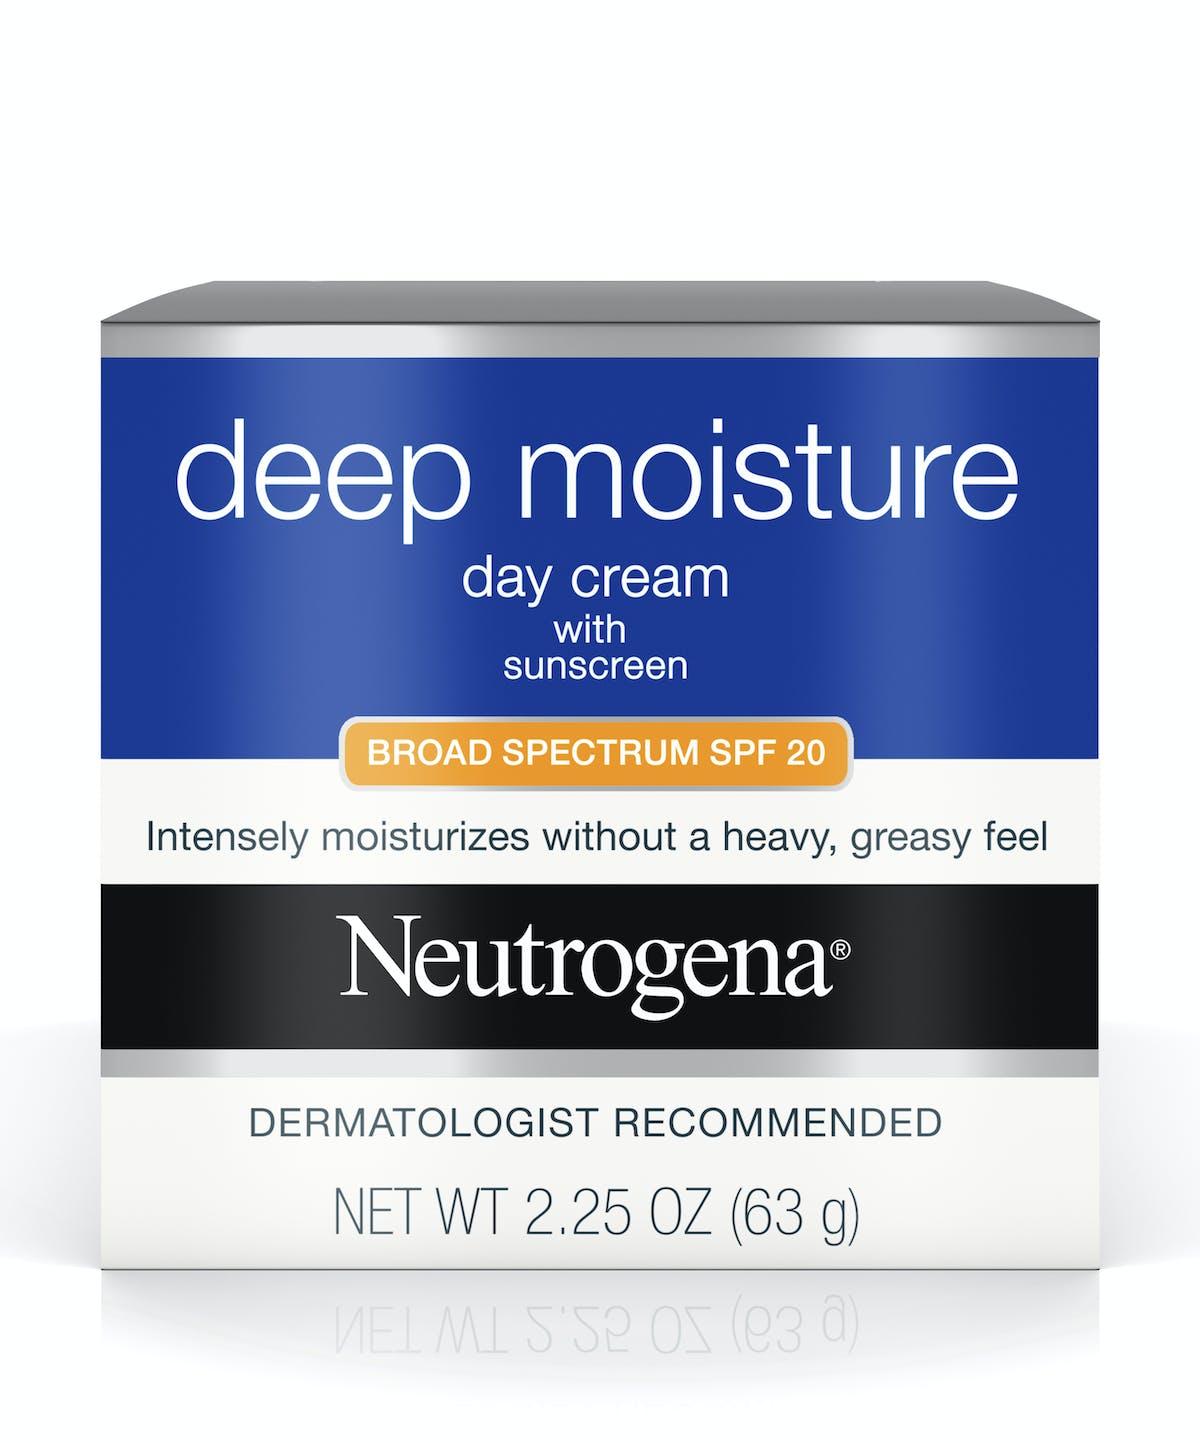 c3913c56dff0 ... Deep Moisture Day Cream with Sunscreen Broad Spectrum SPF 20 ...